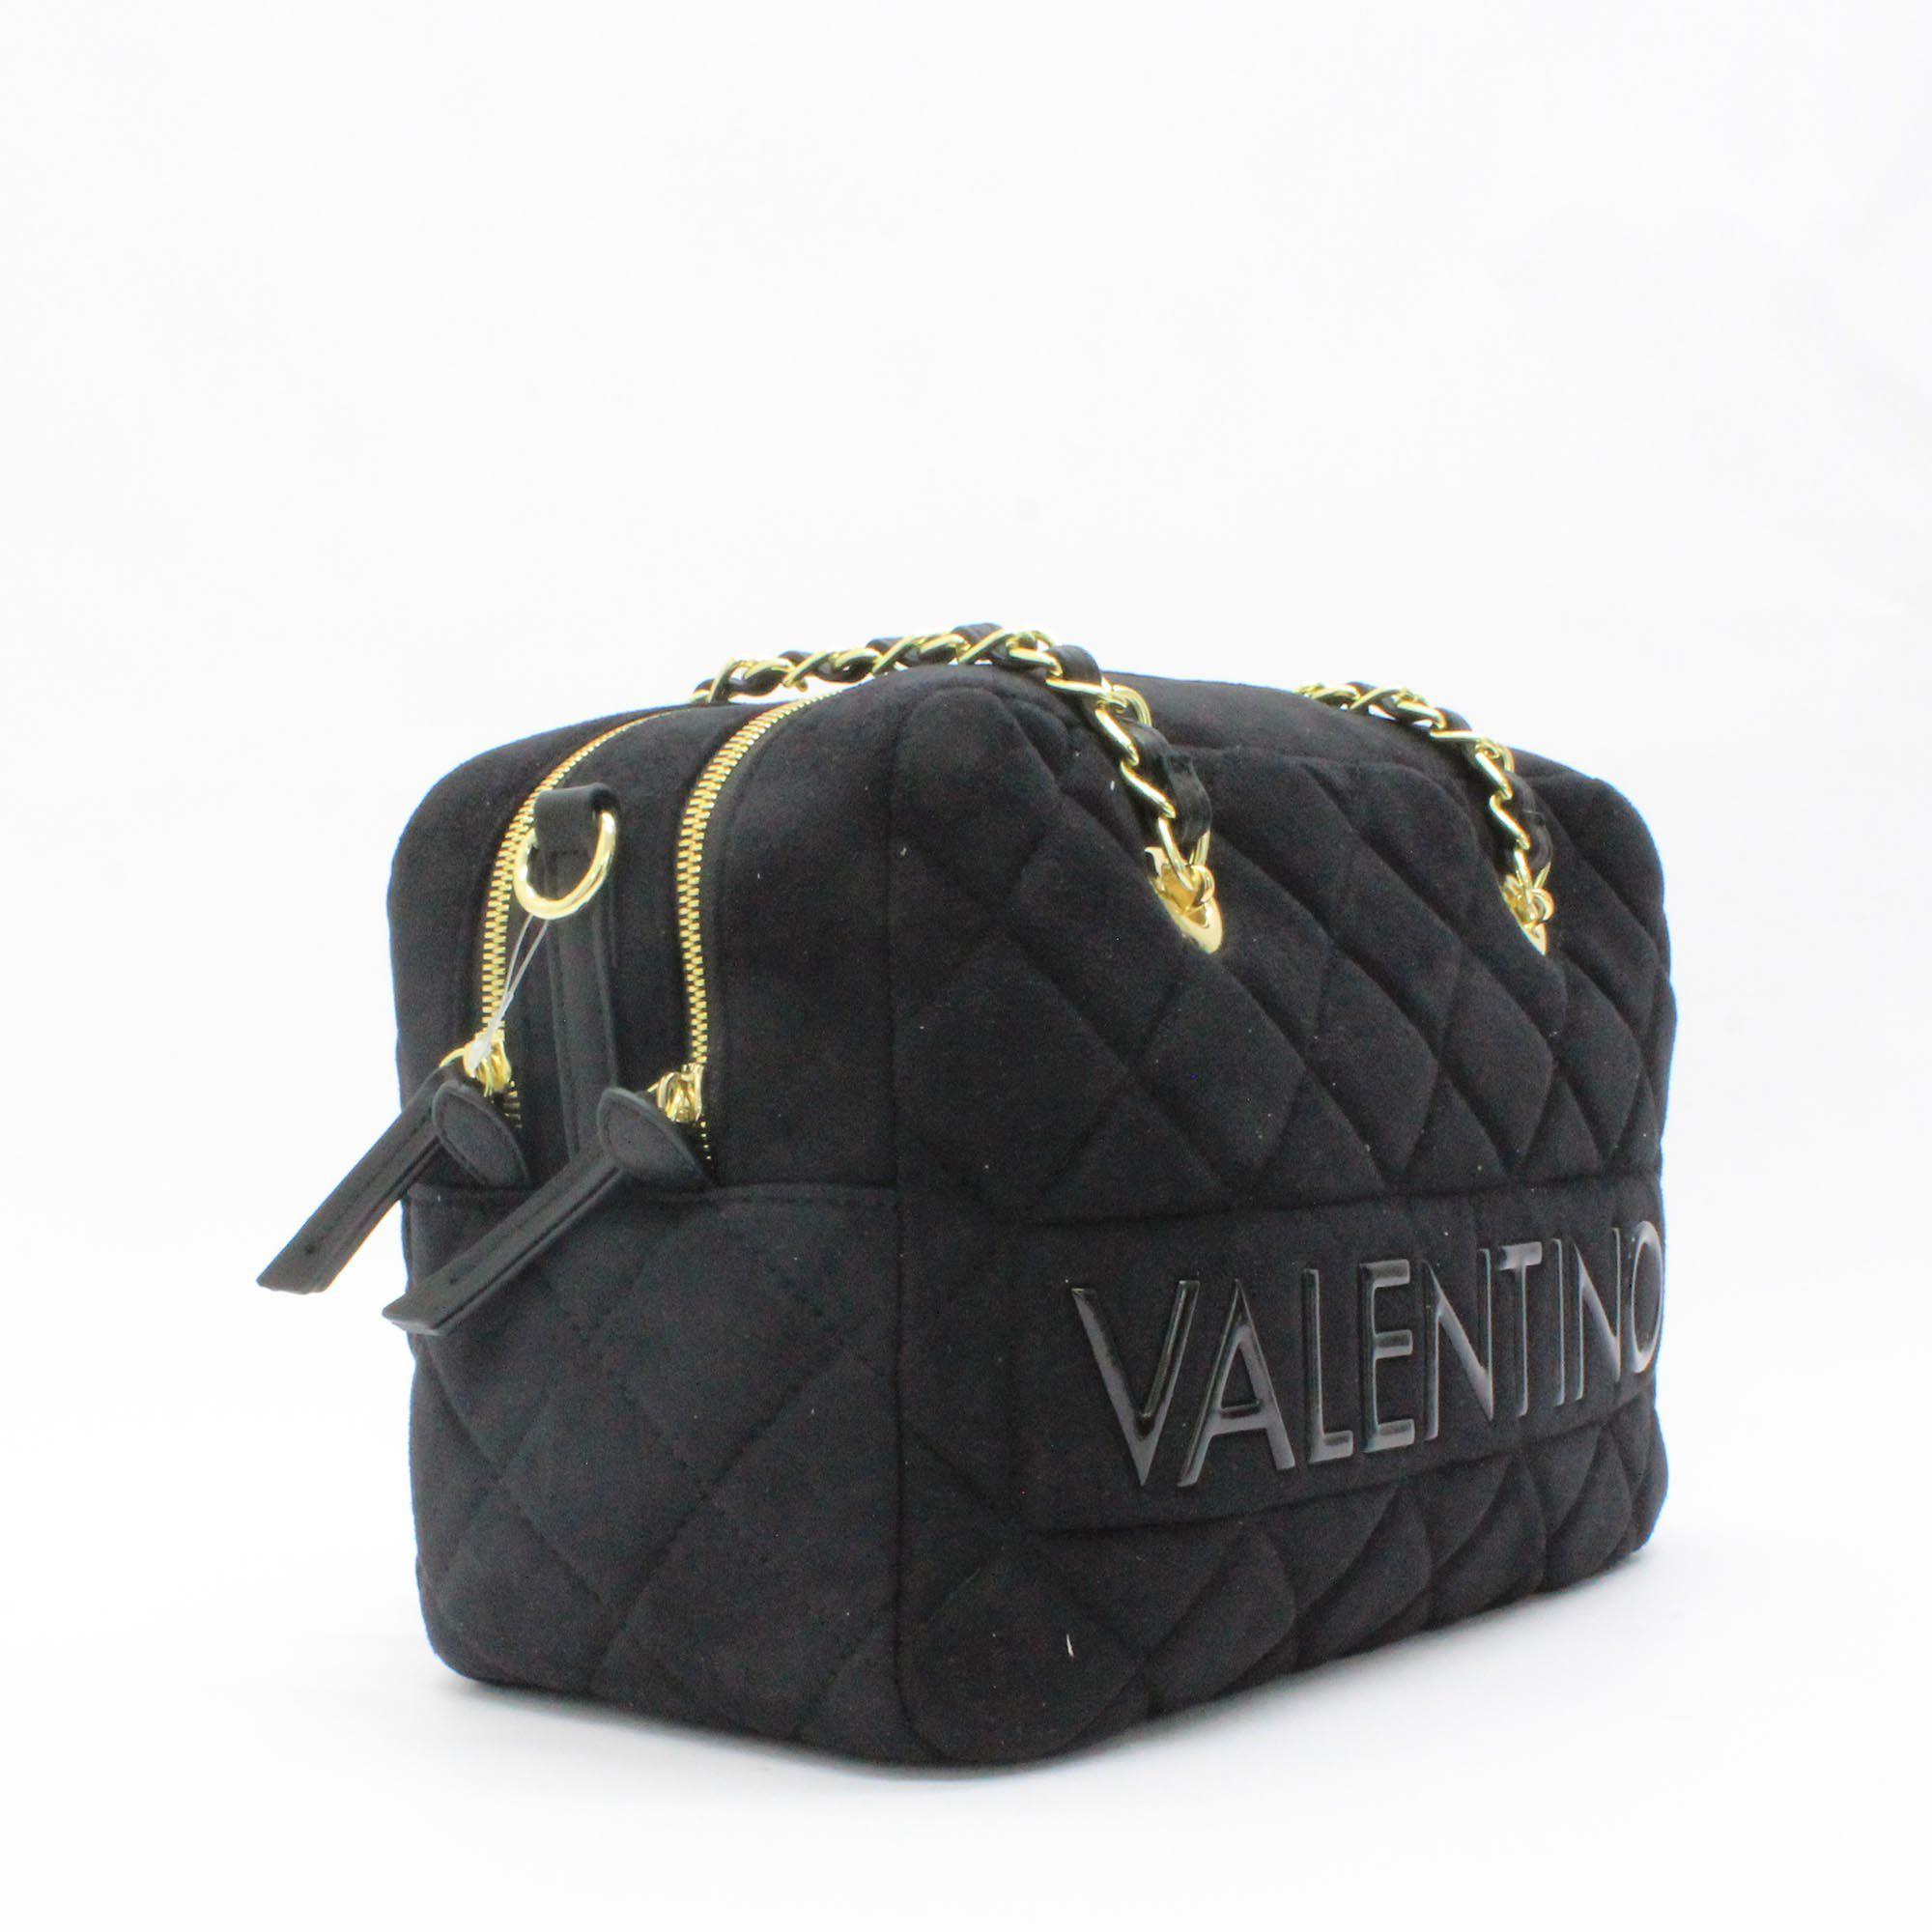 e53421f6c57f Valentino - Arrival Quilt Bowler Bag Black - Lyst. View fullscreen